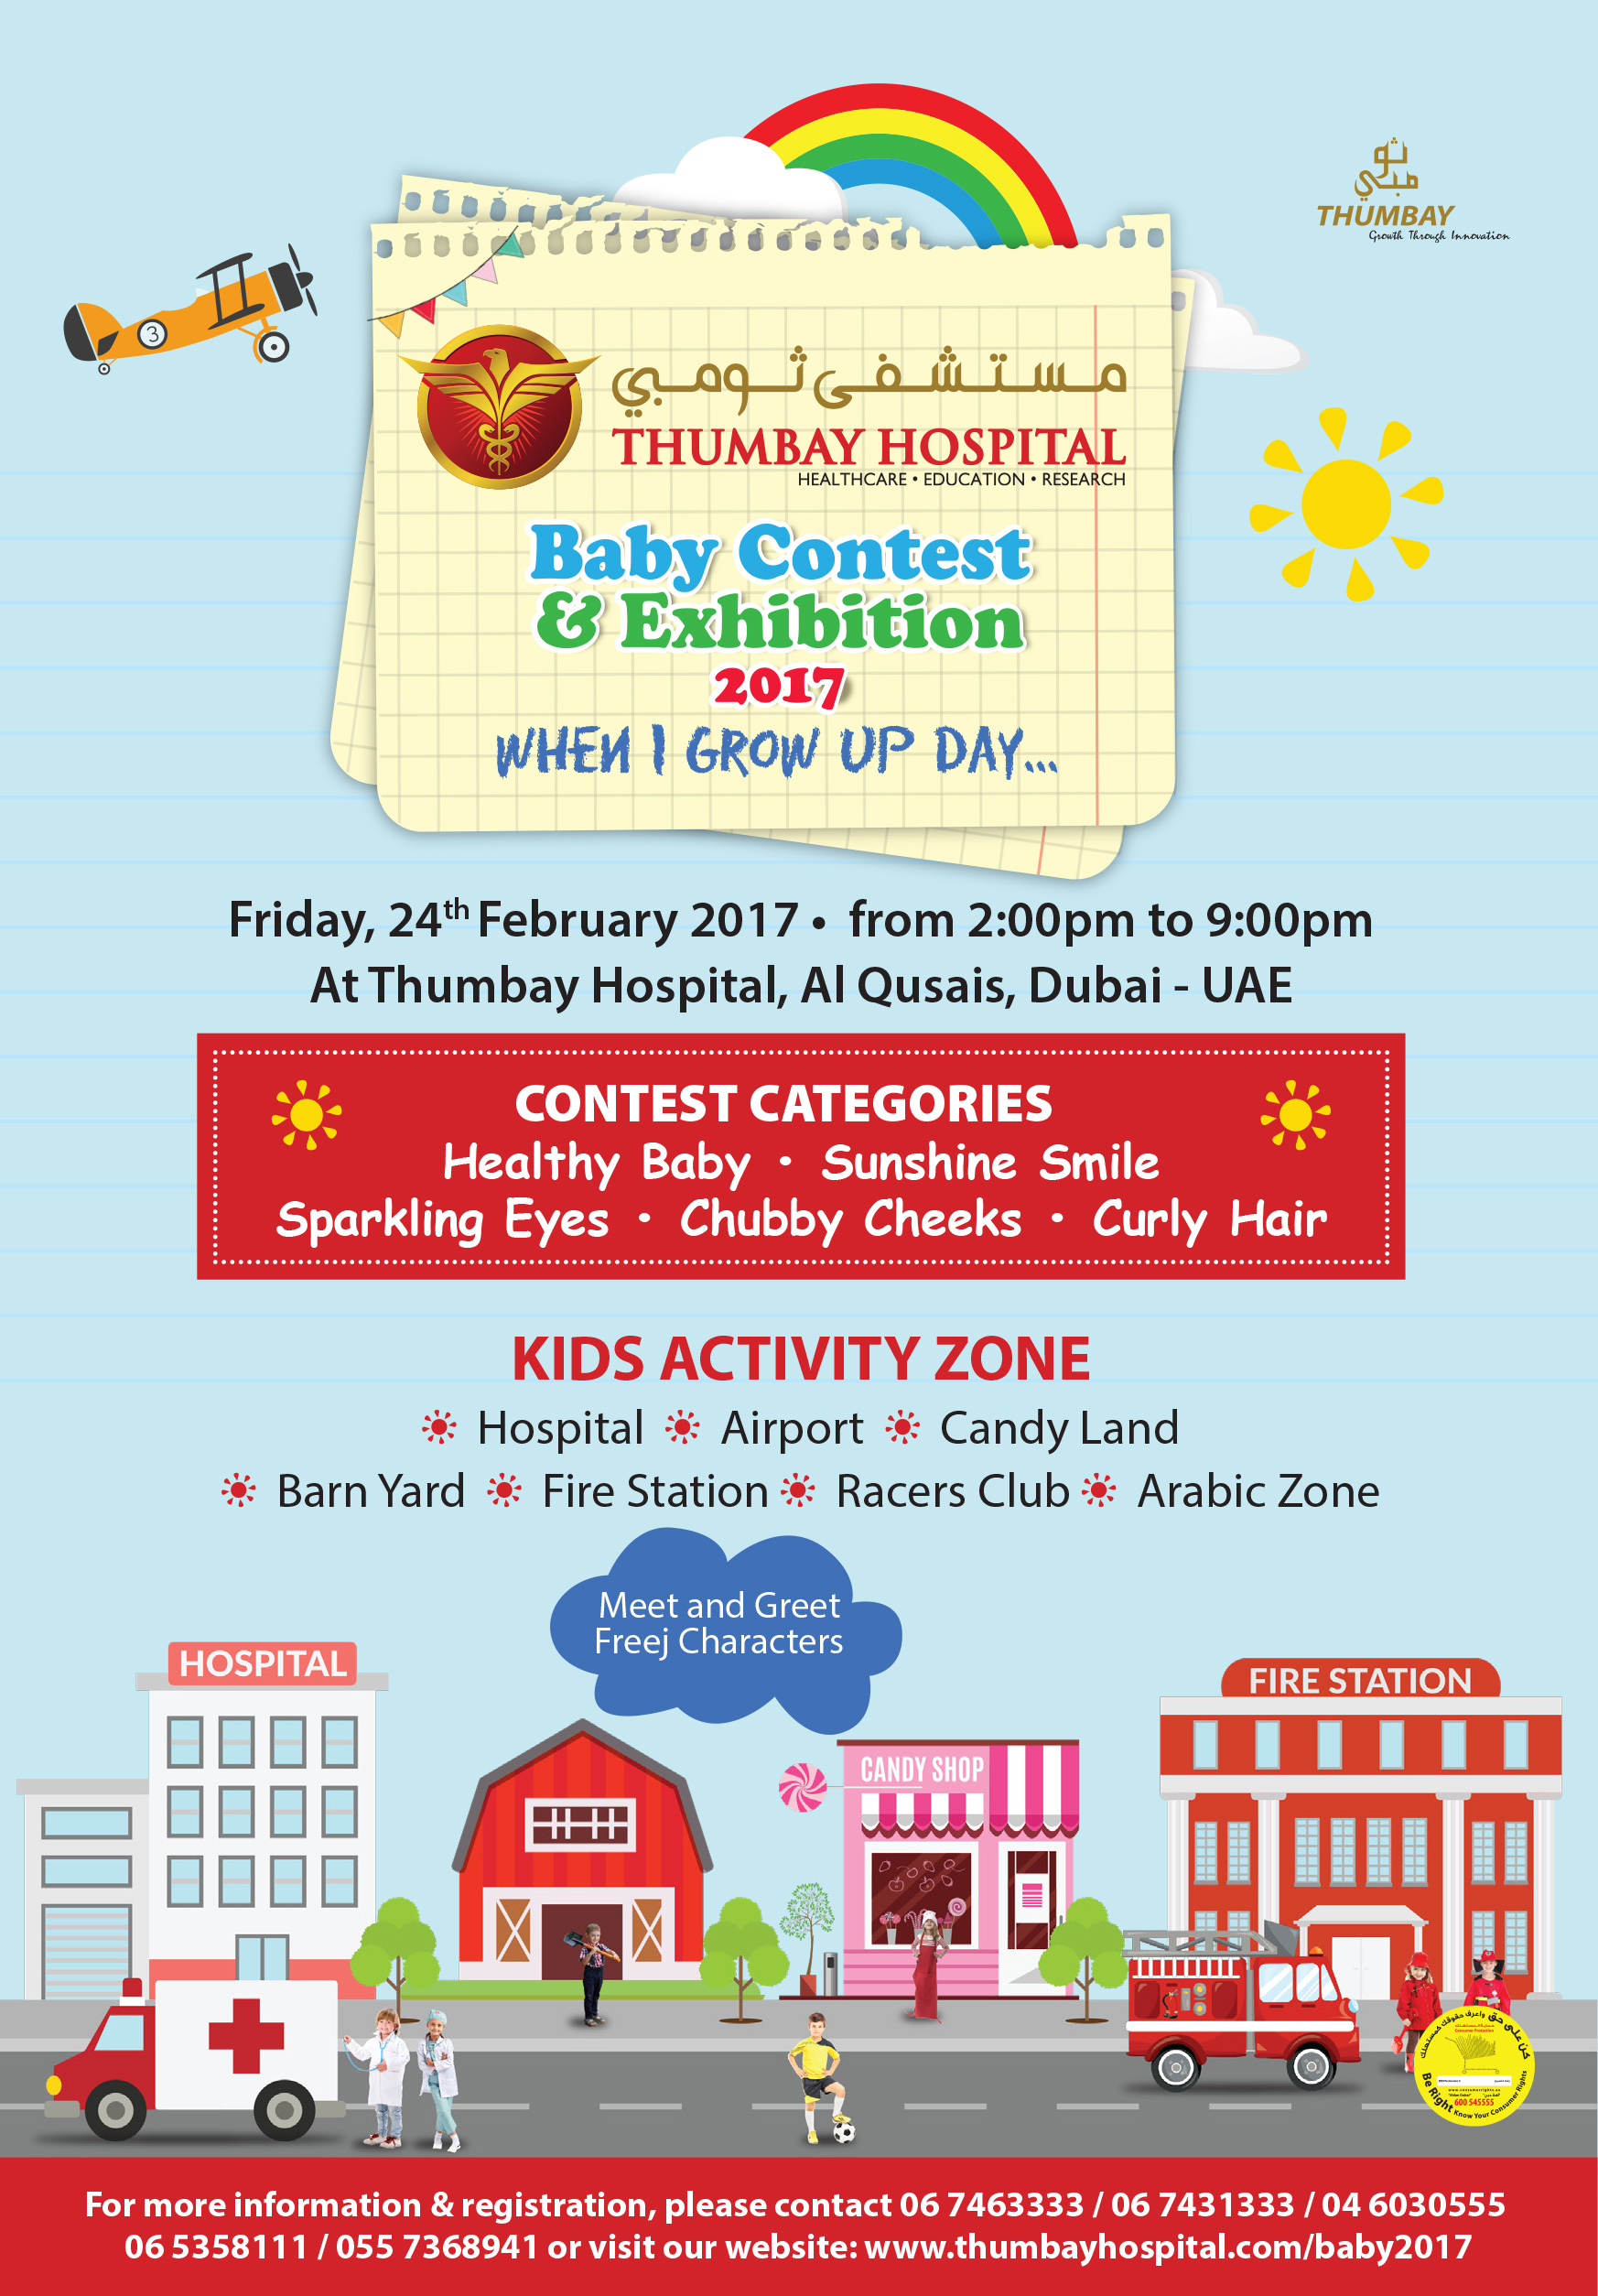 Baby Contest & Exhibition 2017